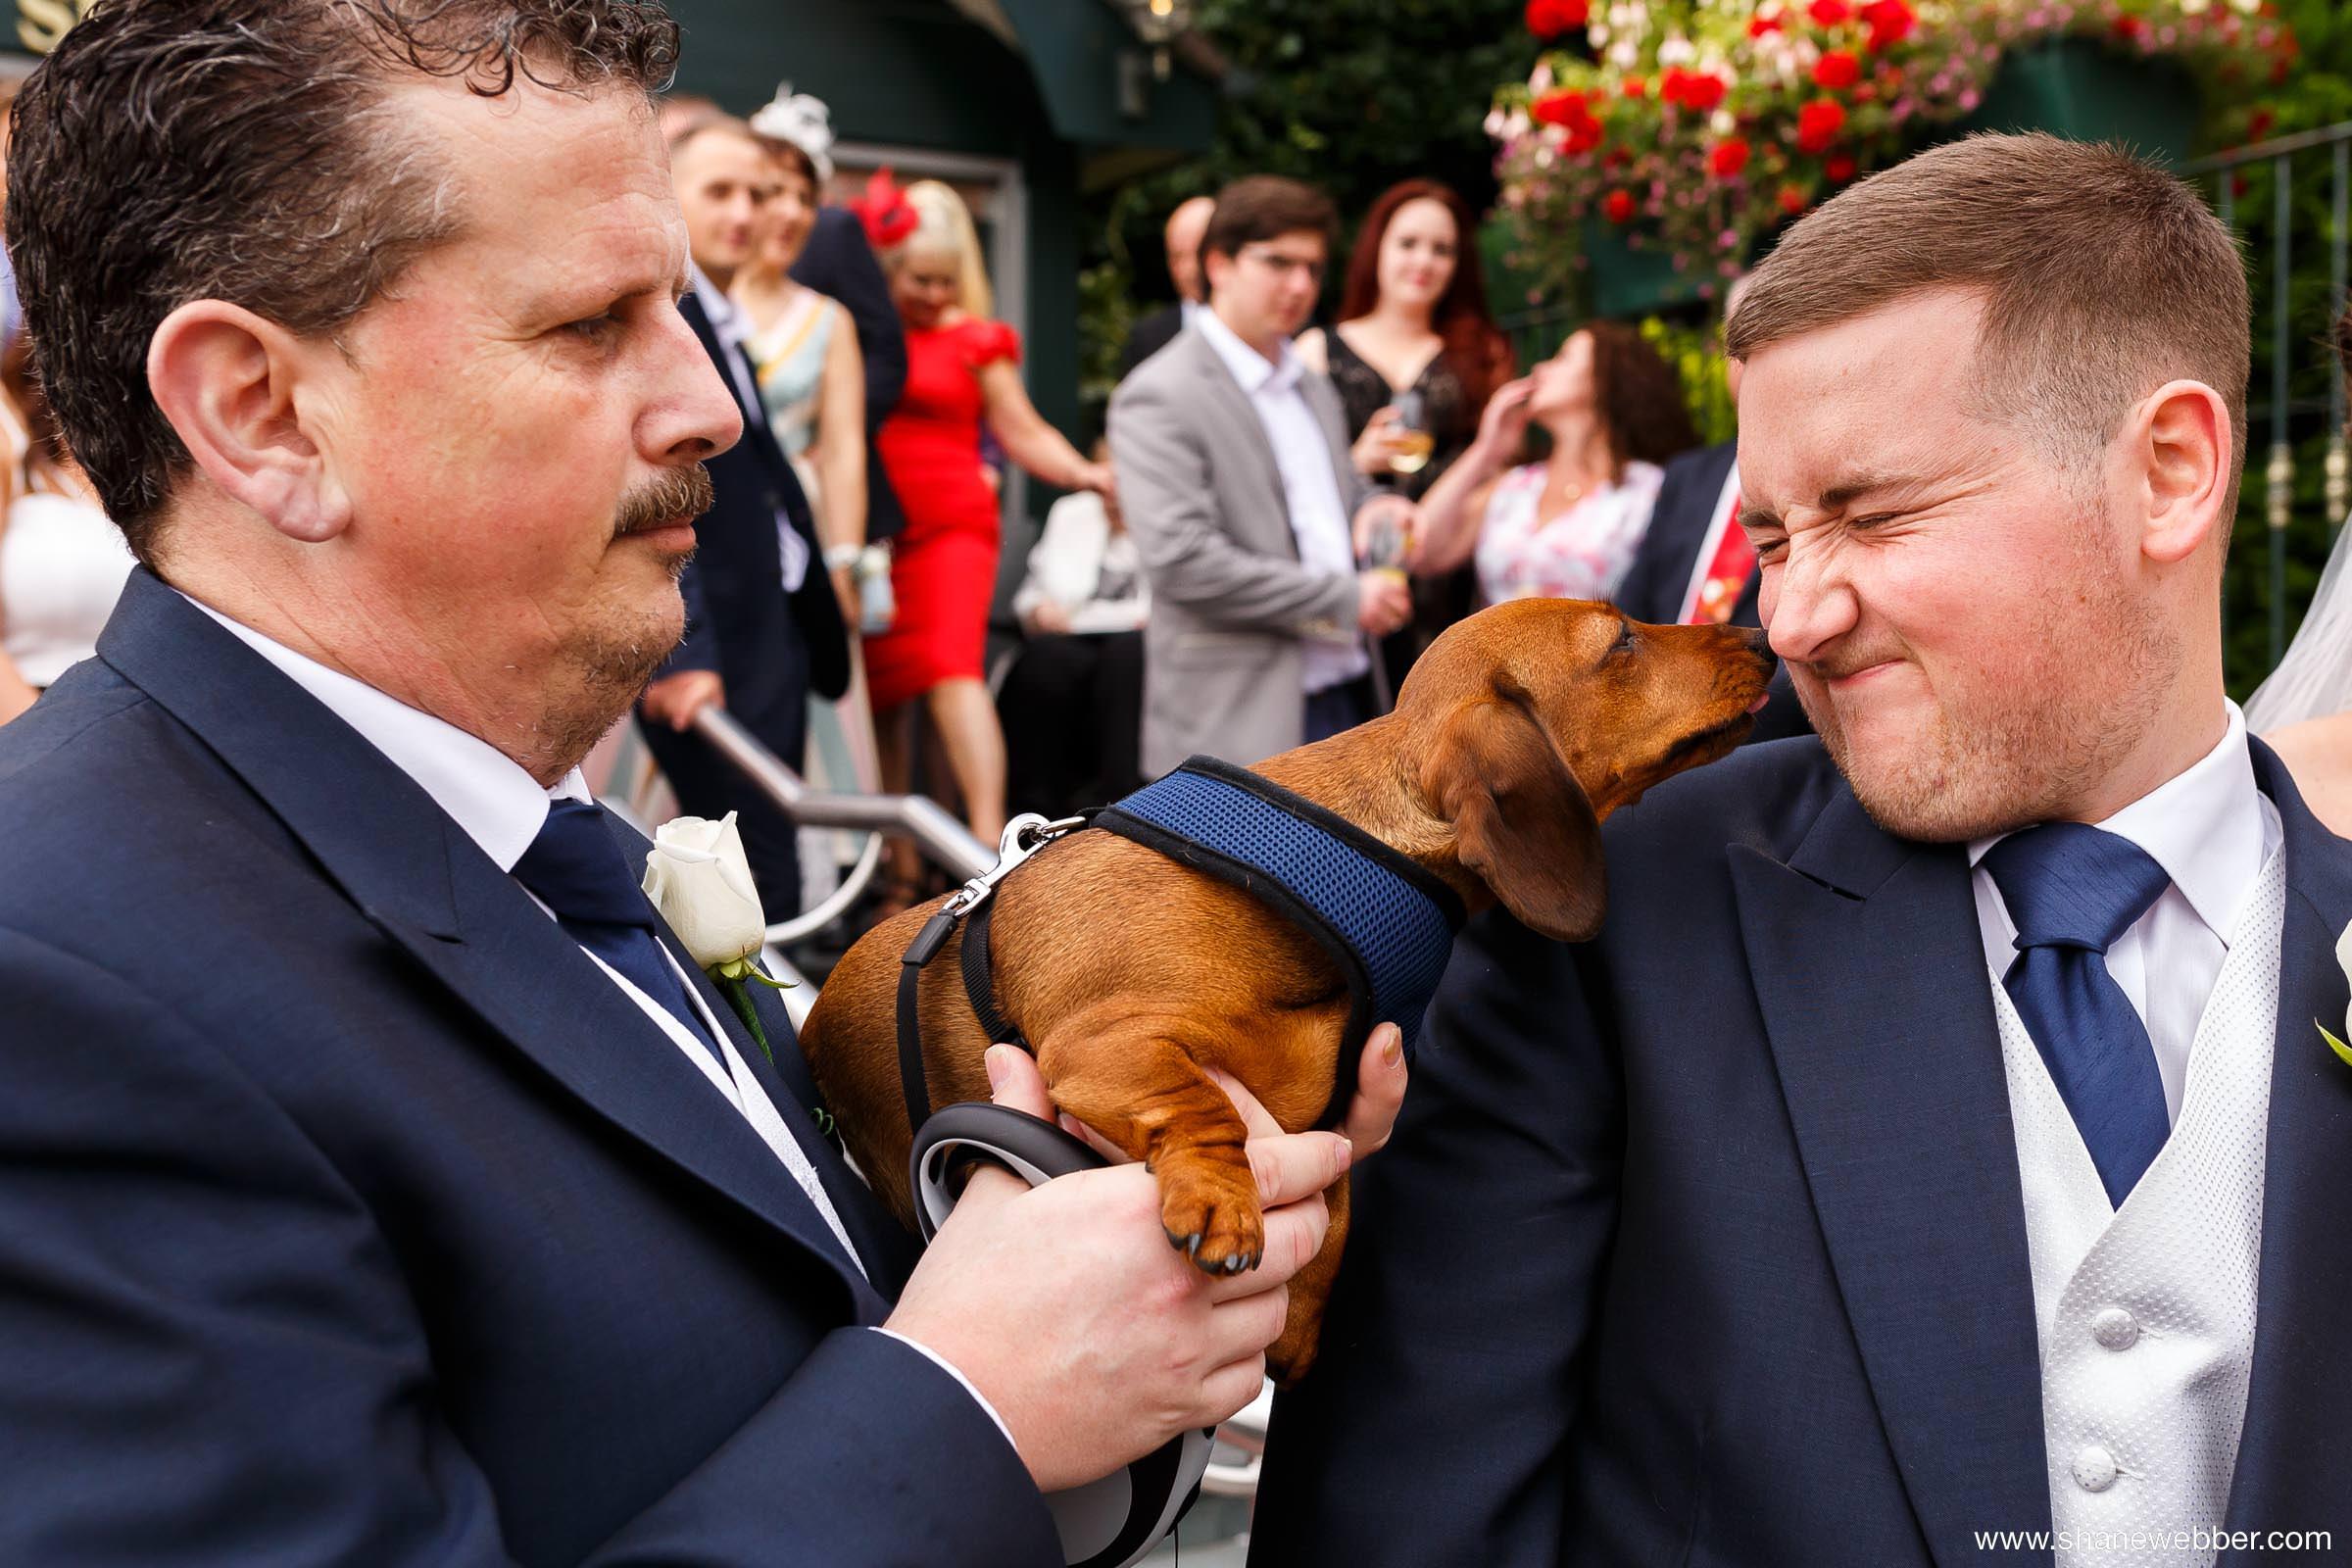 Cute sausage dog puppy at wedding